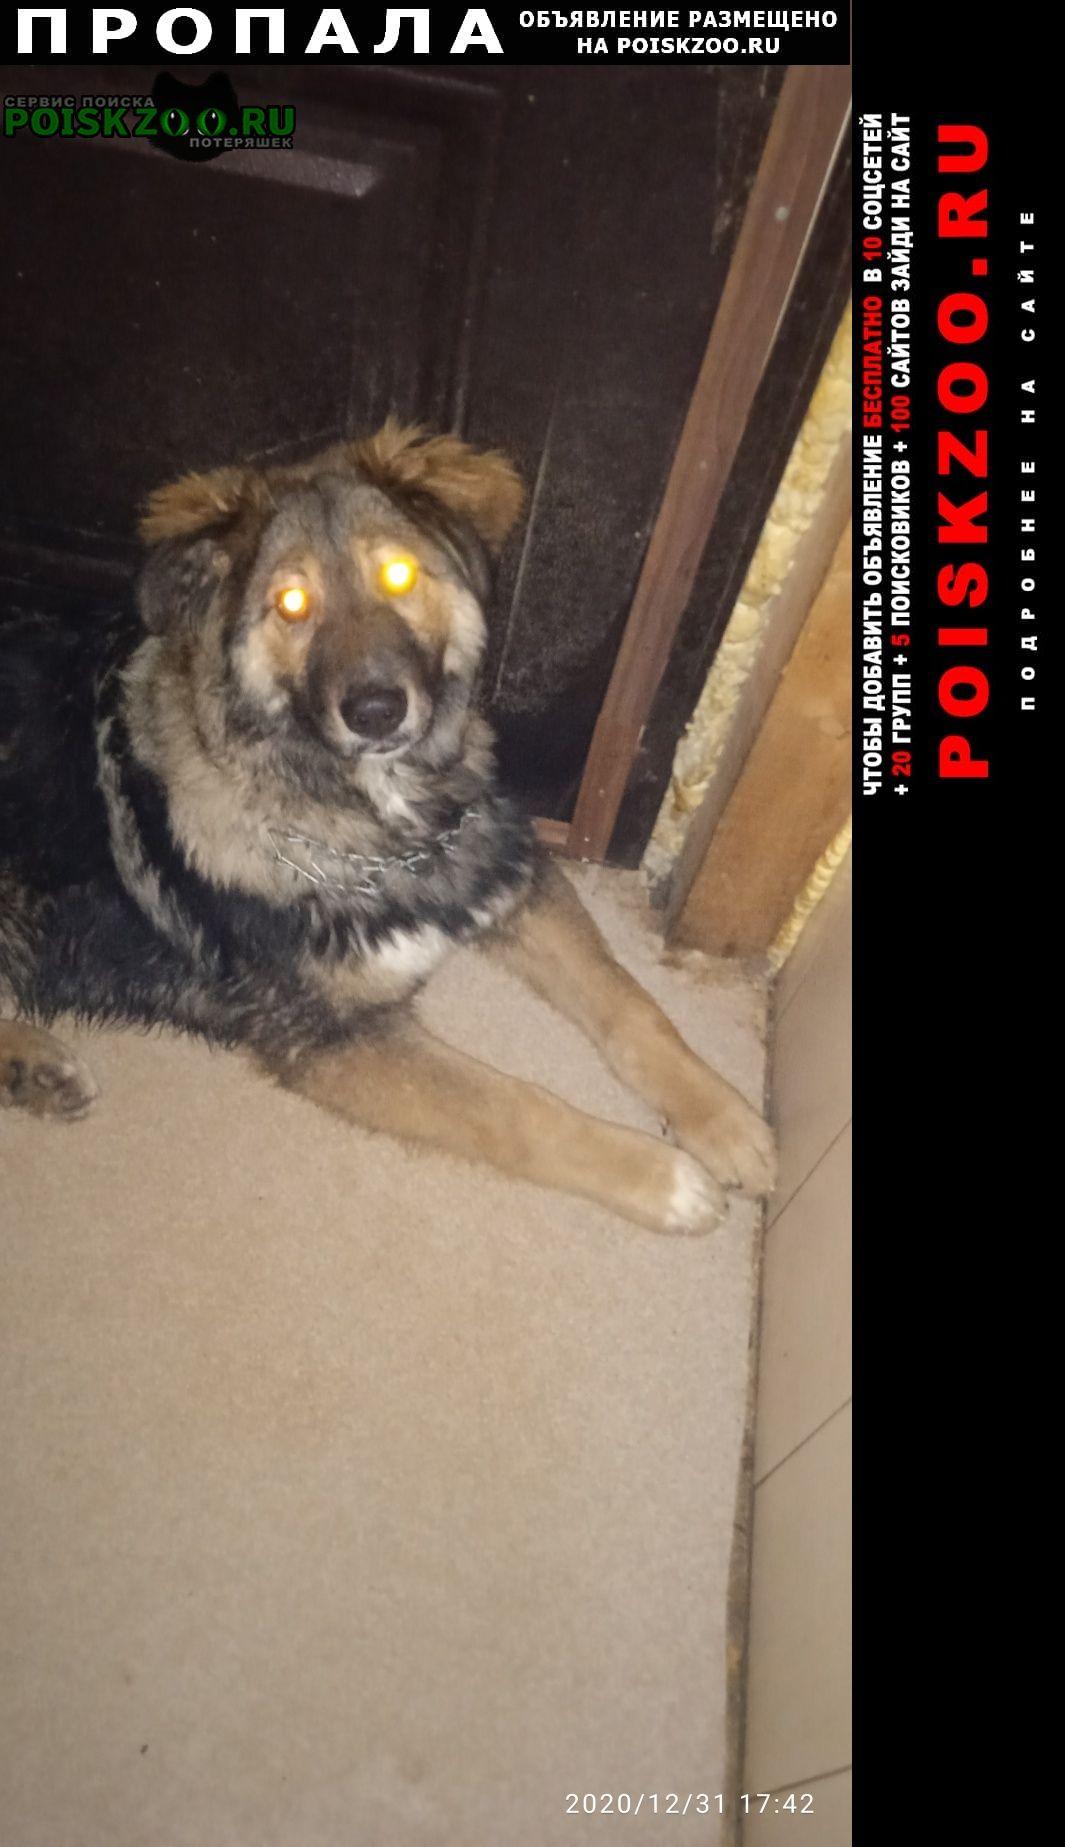 Пропала собака кобель кавказская овчарка Владимир